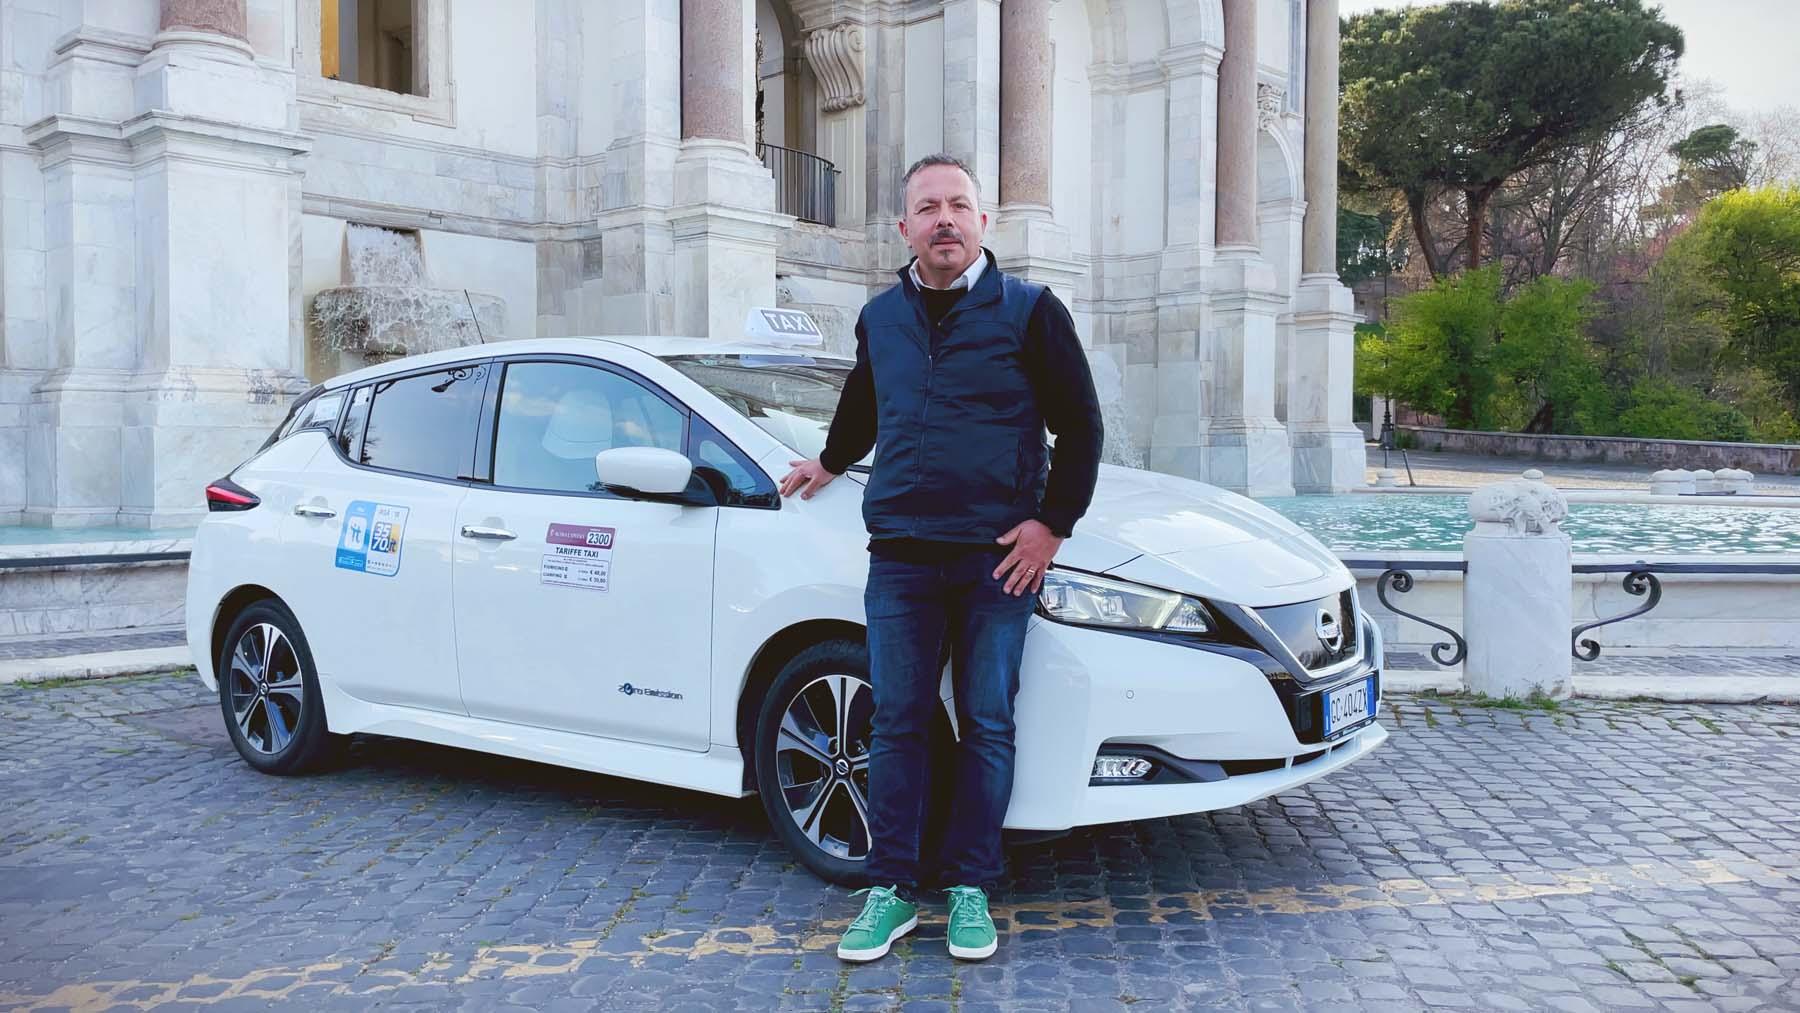 Picture 1 Οι Ευρωπαίοι οδηγοί EVs ταξιδεύουν περισσότερο, σύμφωνα με έρευνα της Nissan Electric cars, electric vehicles, EV, Leaf, Nissan, Nissan LEAF, ειδήσεις, ηλεκτρικά, ηλεκτροκινηση, Νέα